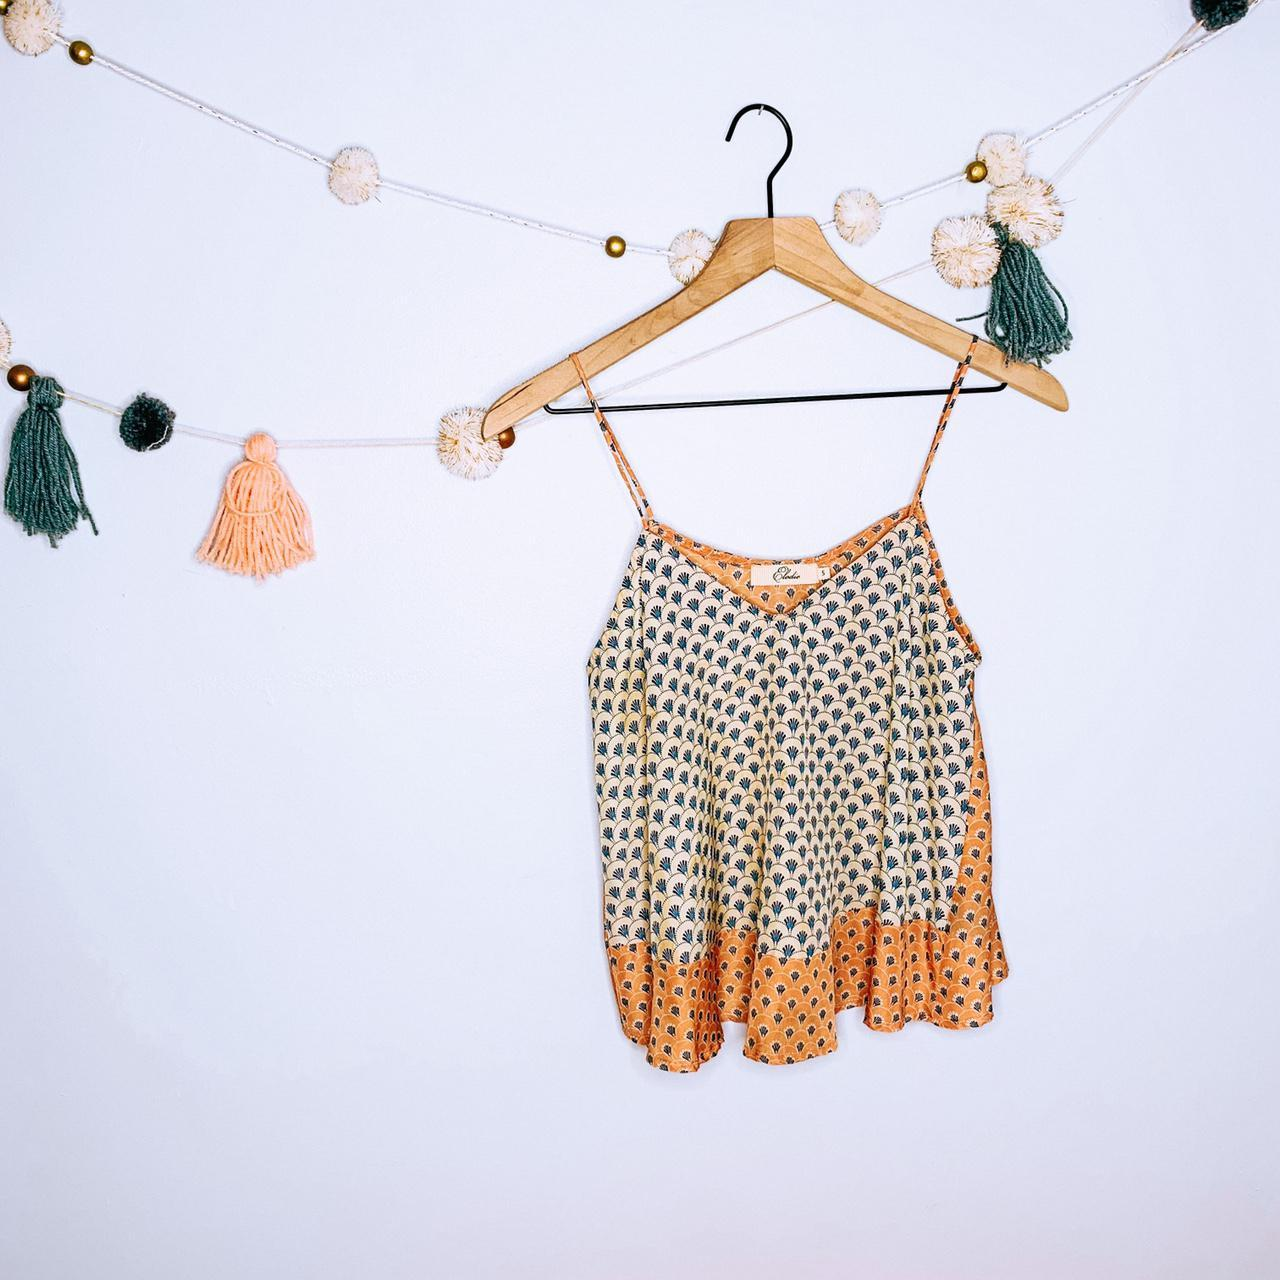 Product Image 1 - Elodie handkerchief flowy patterned crop